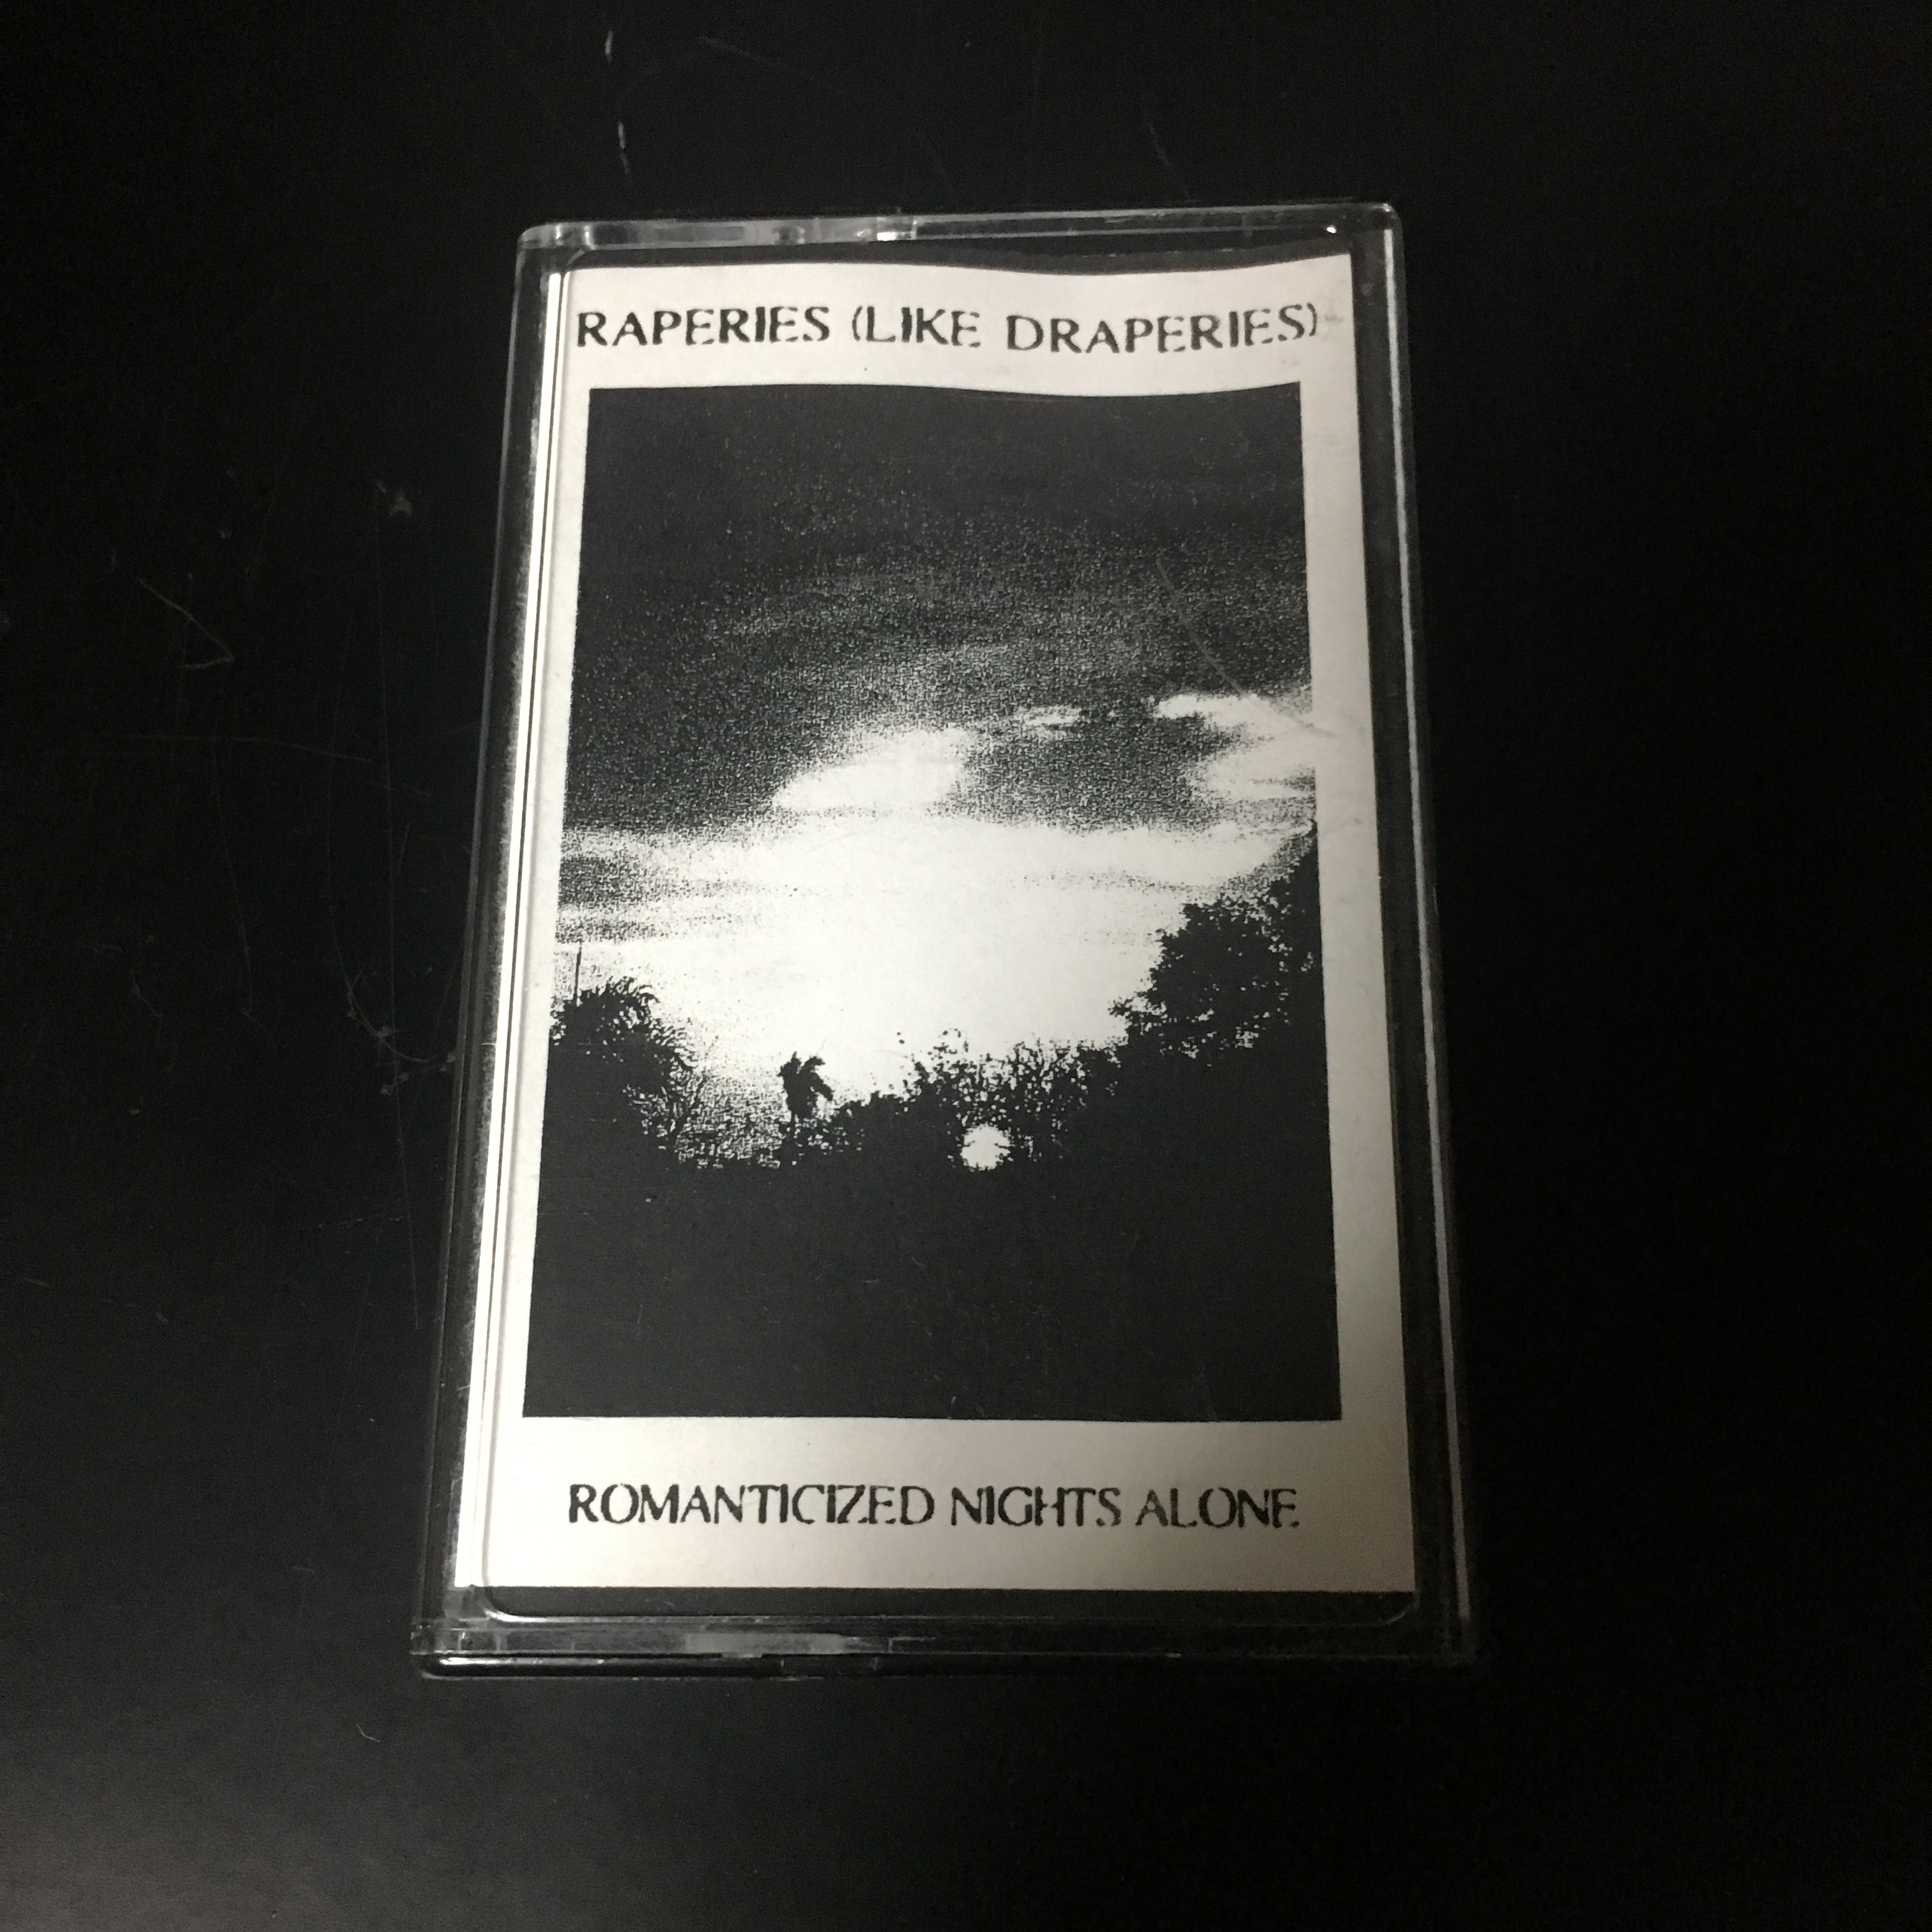 Raperies (Like Draperies) – Romanticized Nights Alone